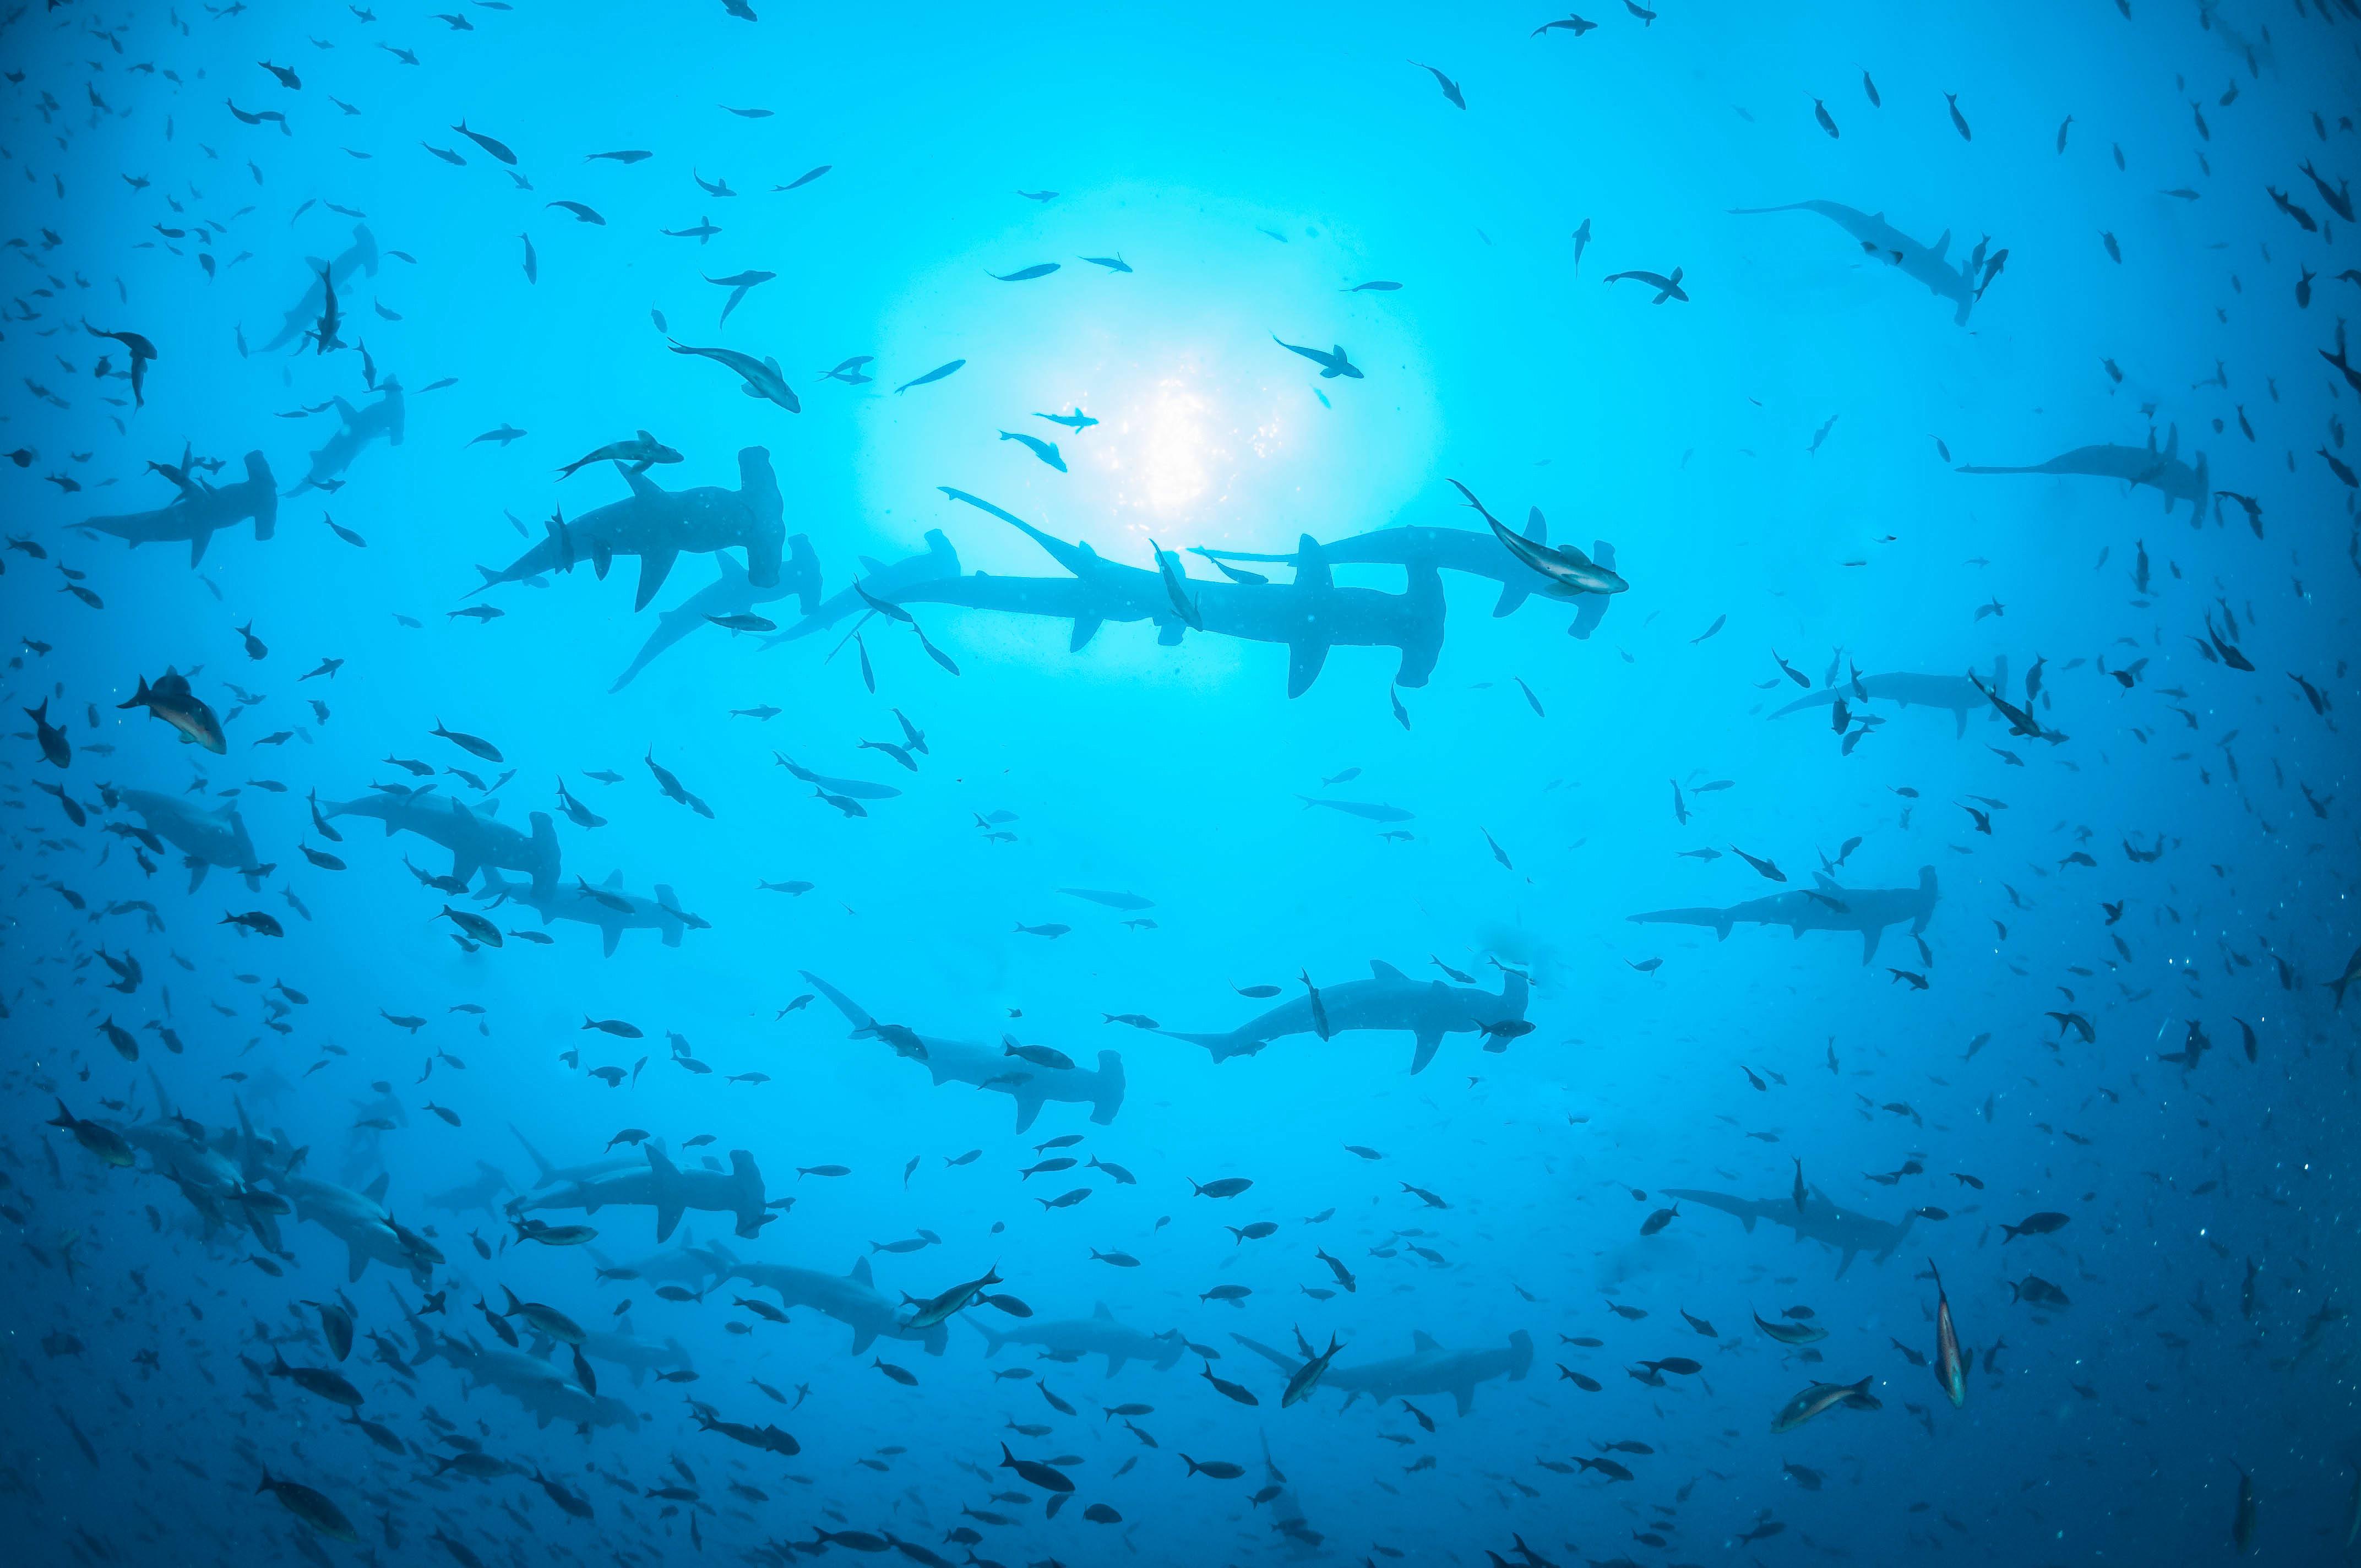 Wallpaper Ocean School Sea Fish Water Shark Ecuador Underwater Scuba Diving Galapagos Adventure Predator Adrenaline Equator Hammerhead 4288x2848 938734 Hd Wallpapers Wallhere